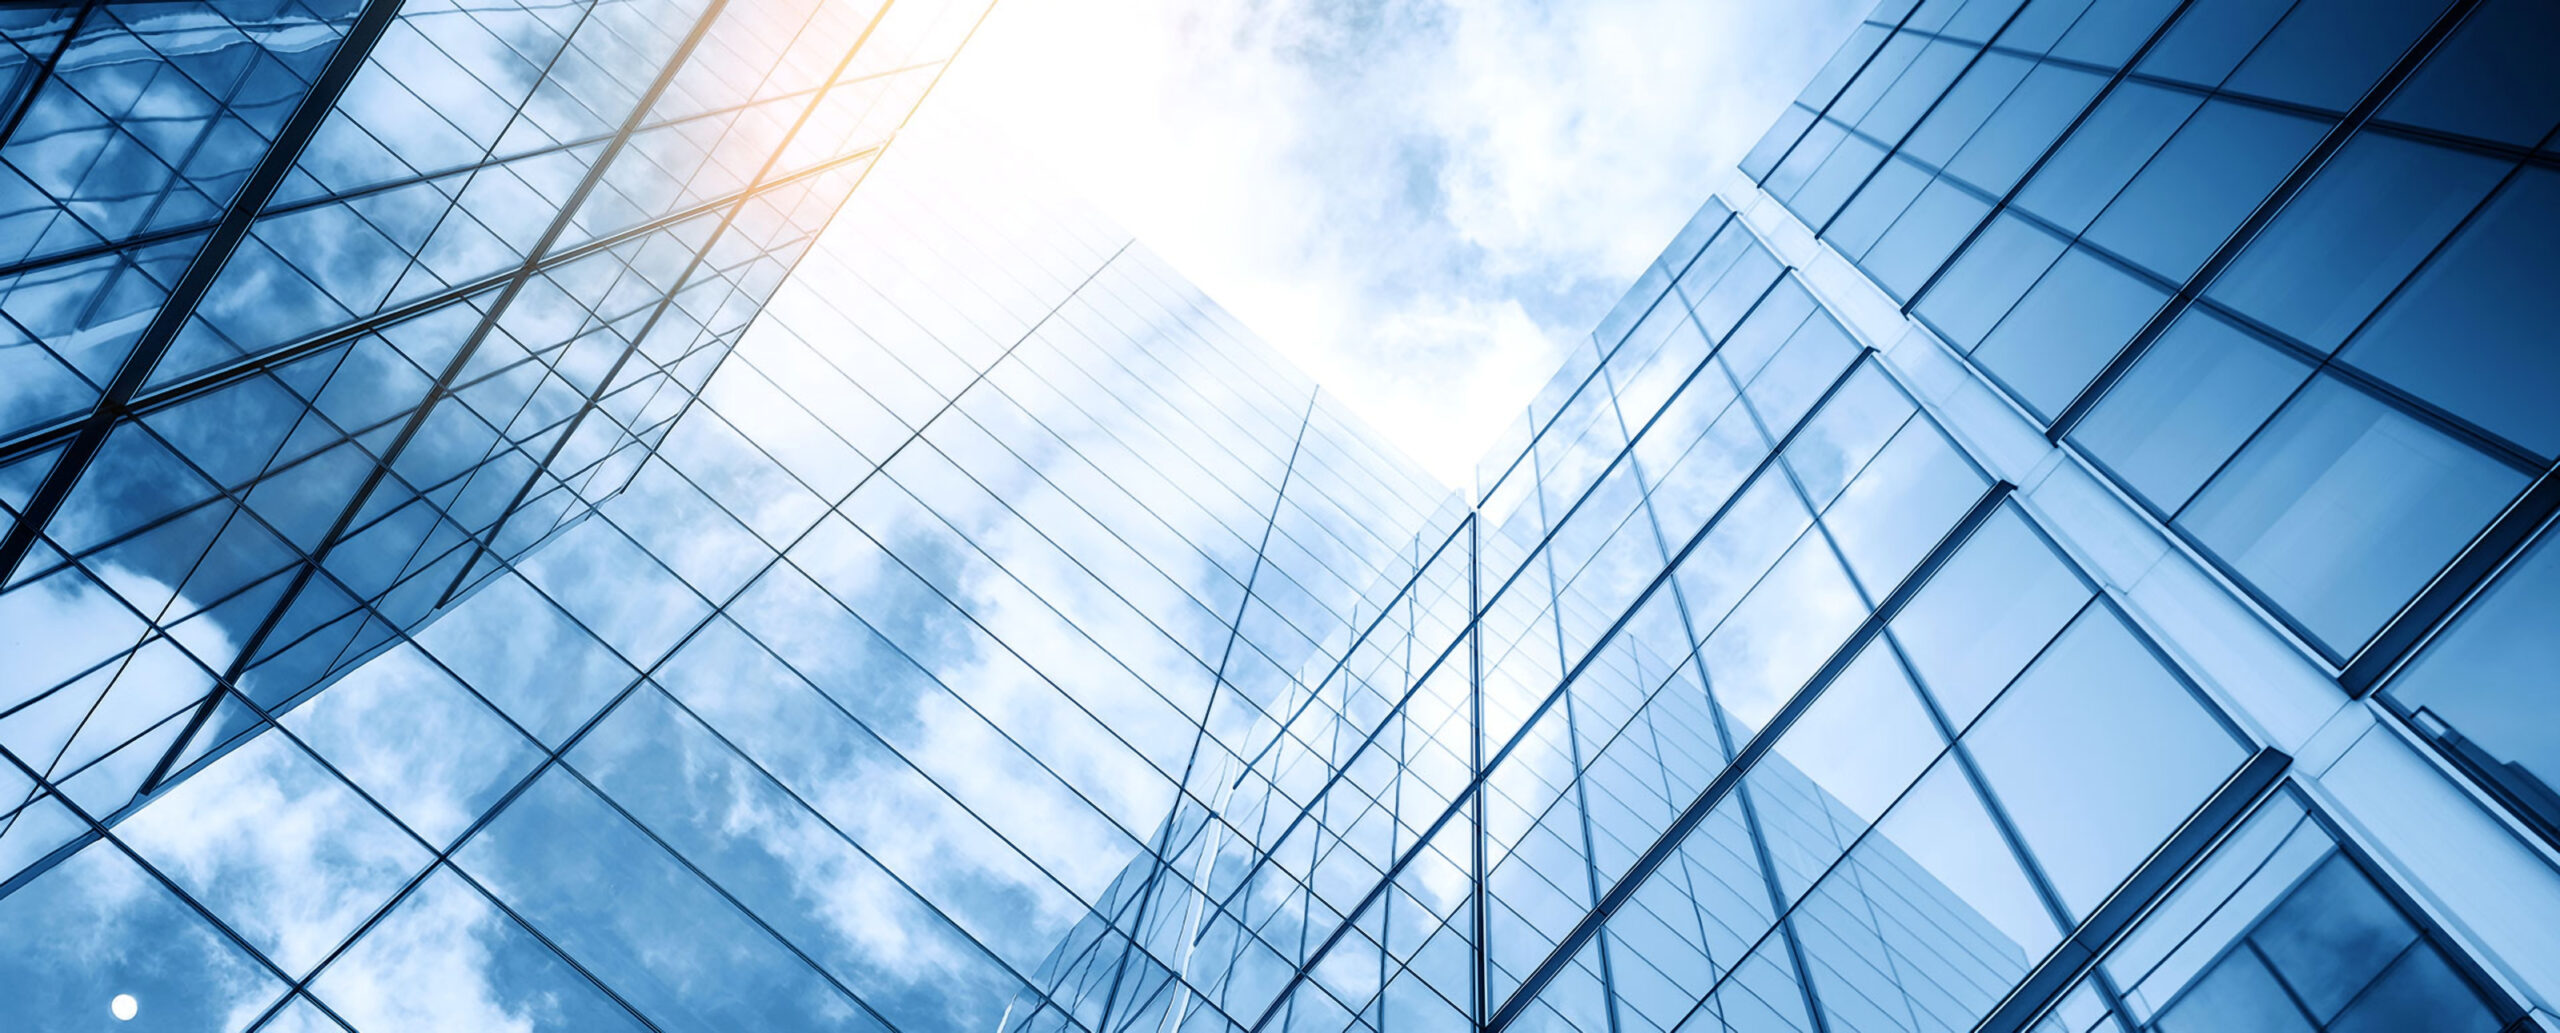 HVAC & Building Automation Wireless mesh